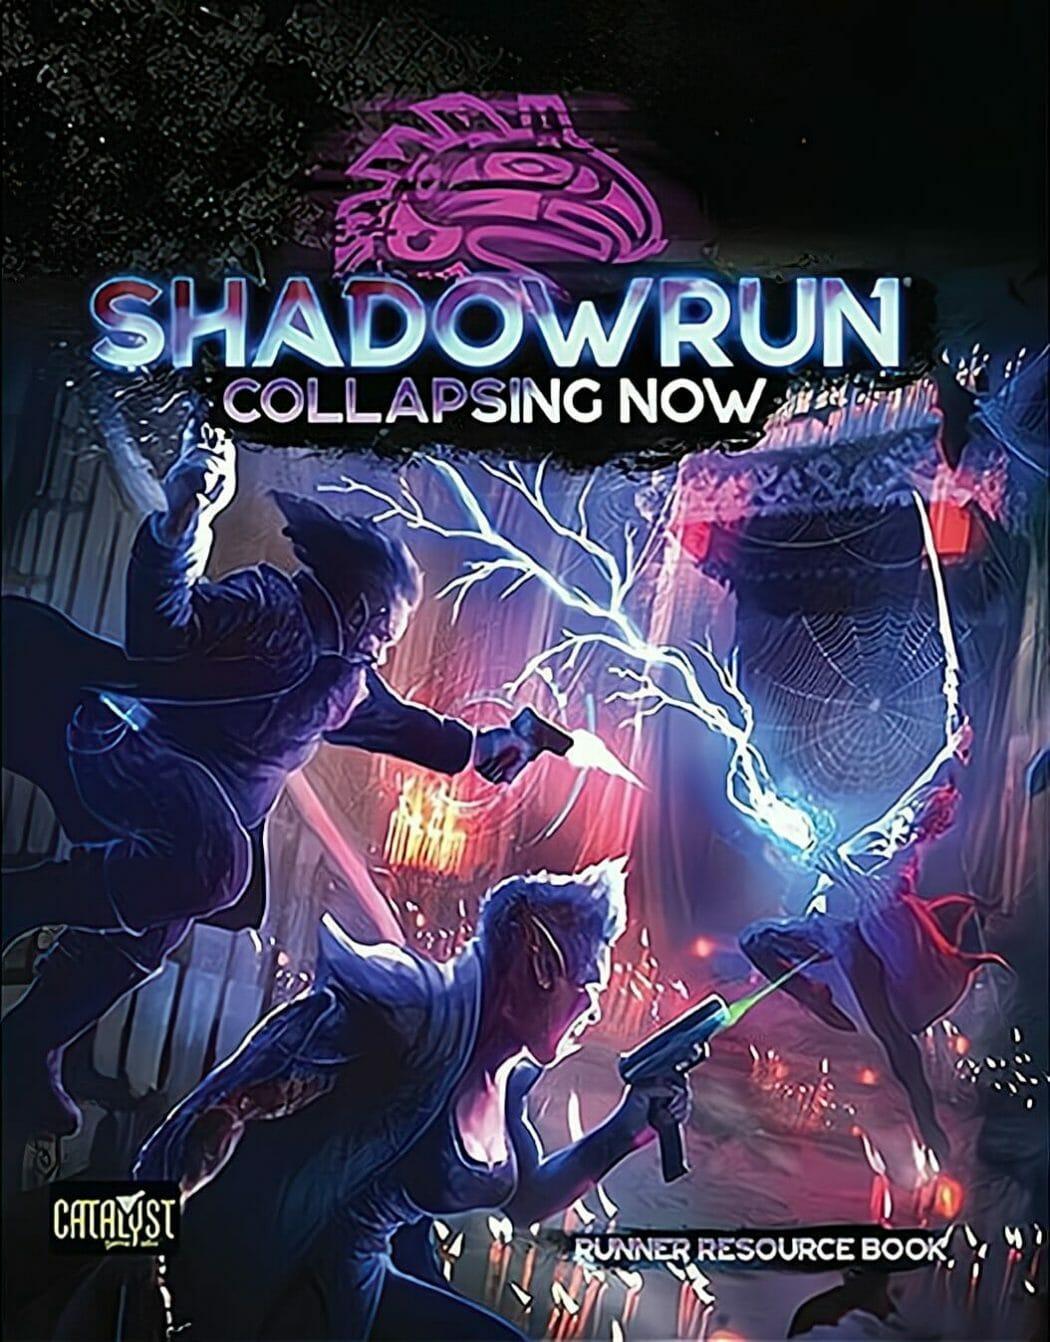 shadowrun-collapsing-now.jpg